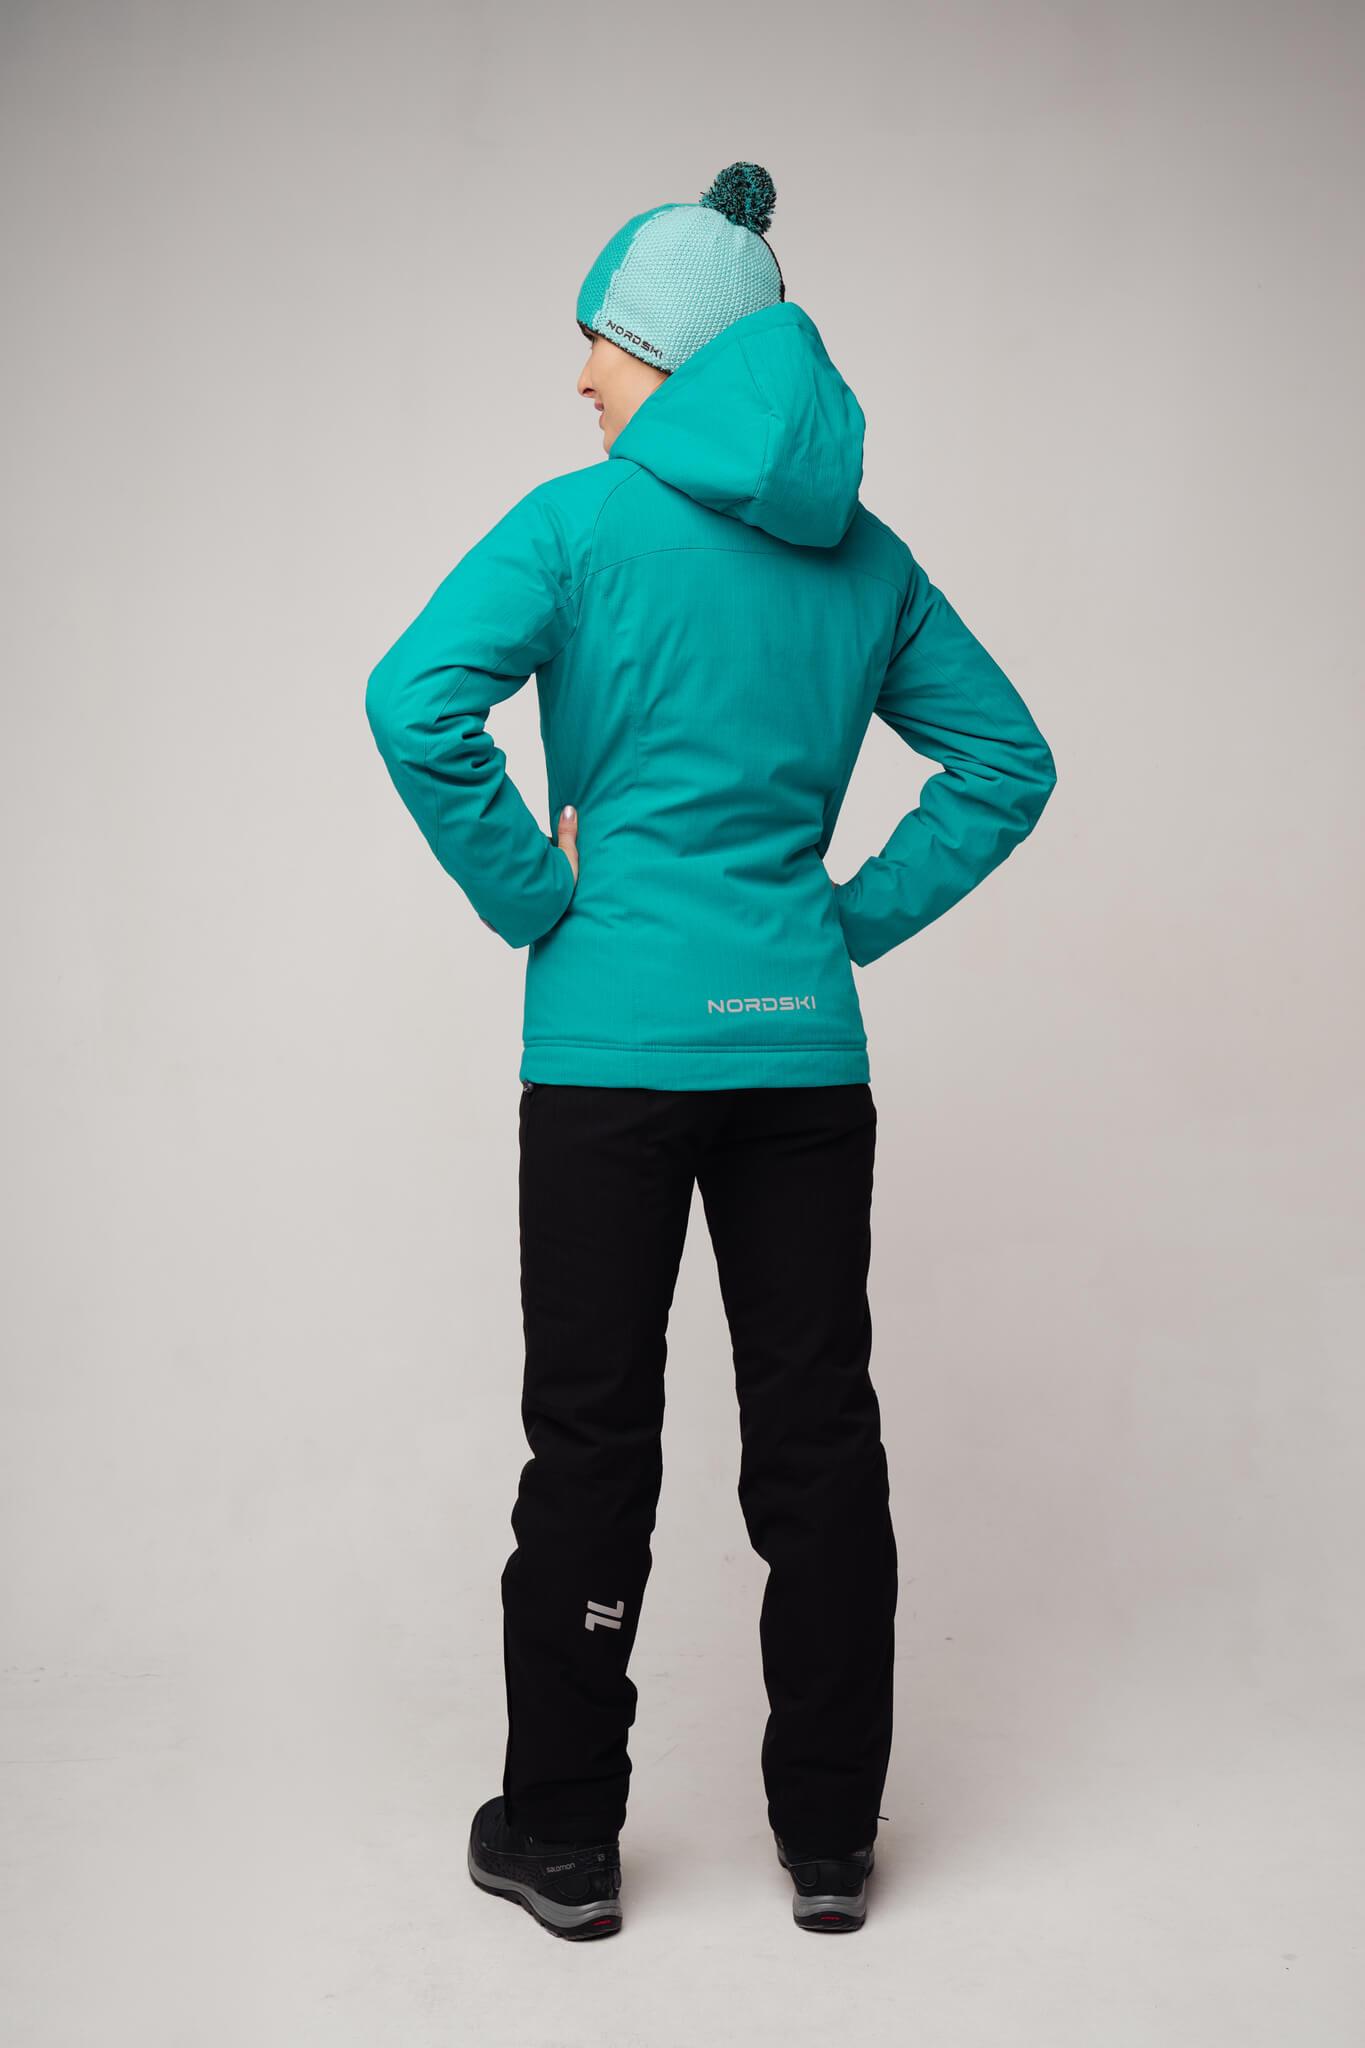 Nordski Pulse Mount теплый лыжный костюм женский - 2